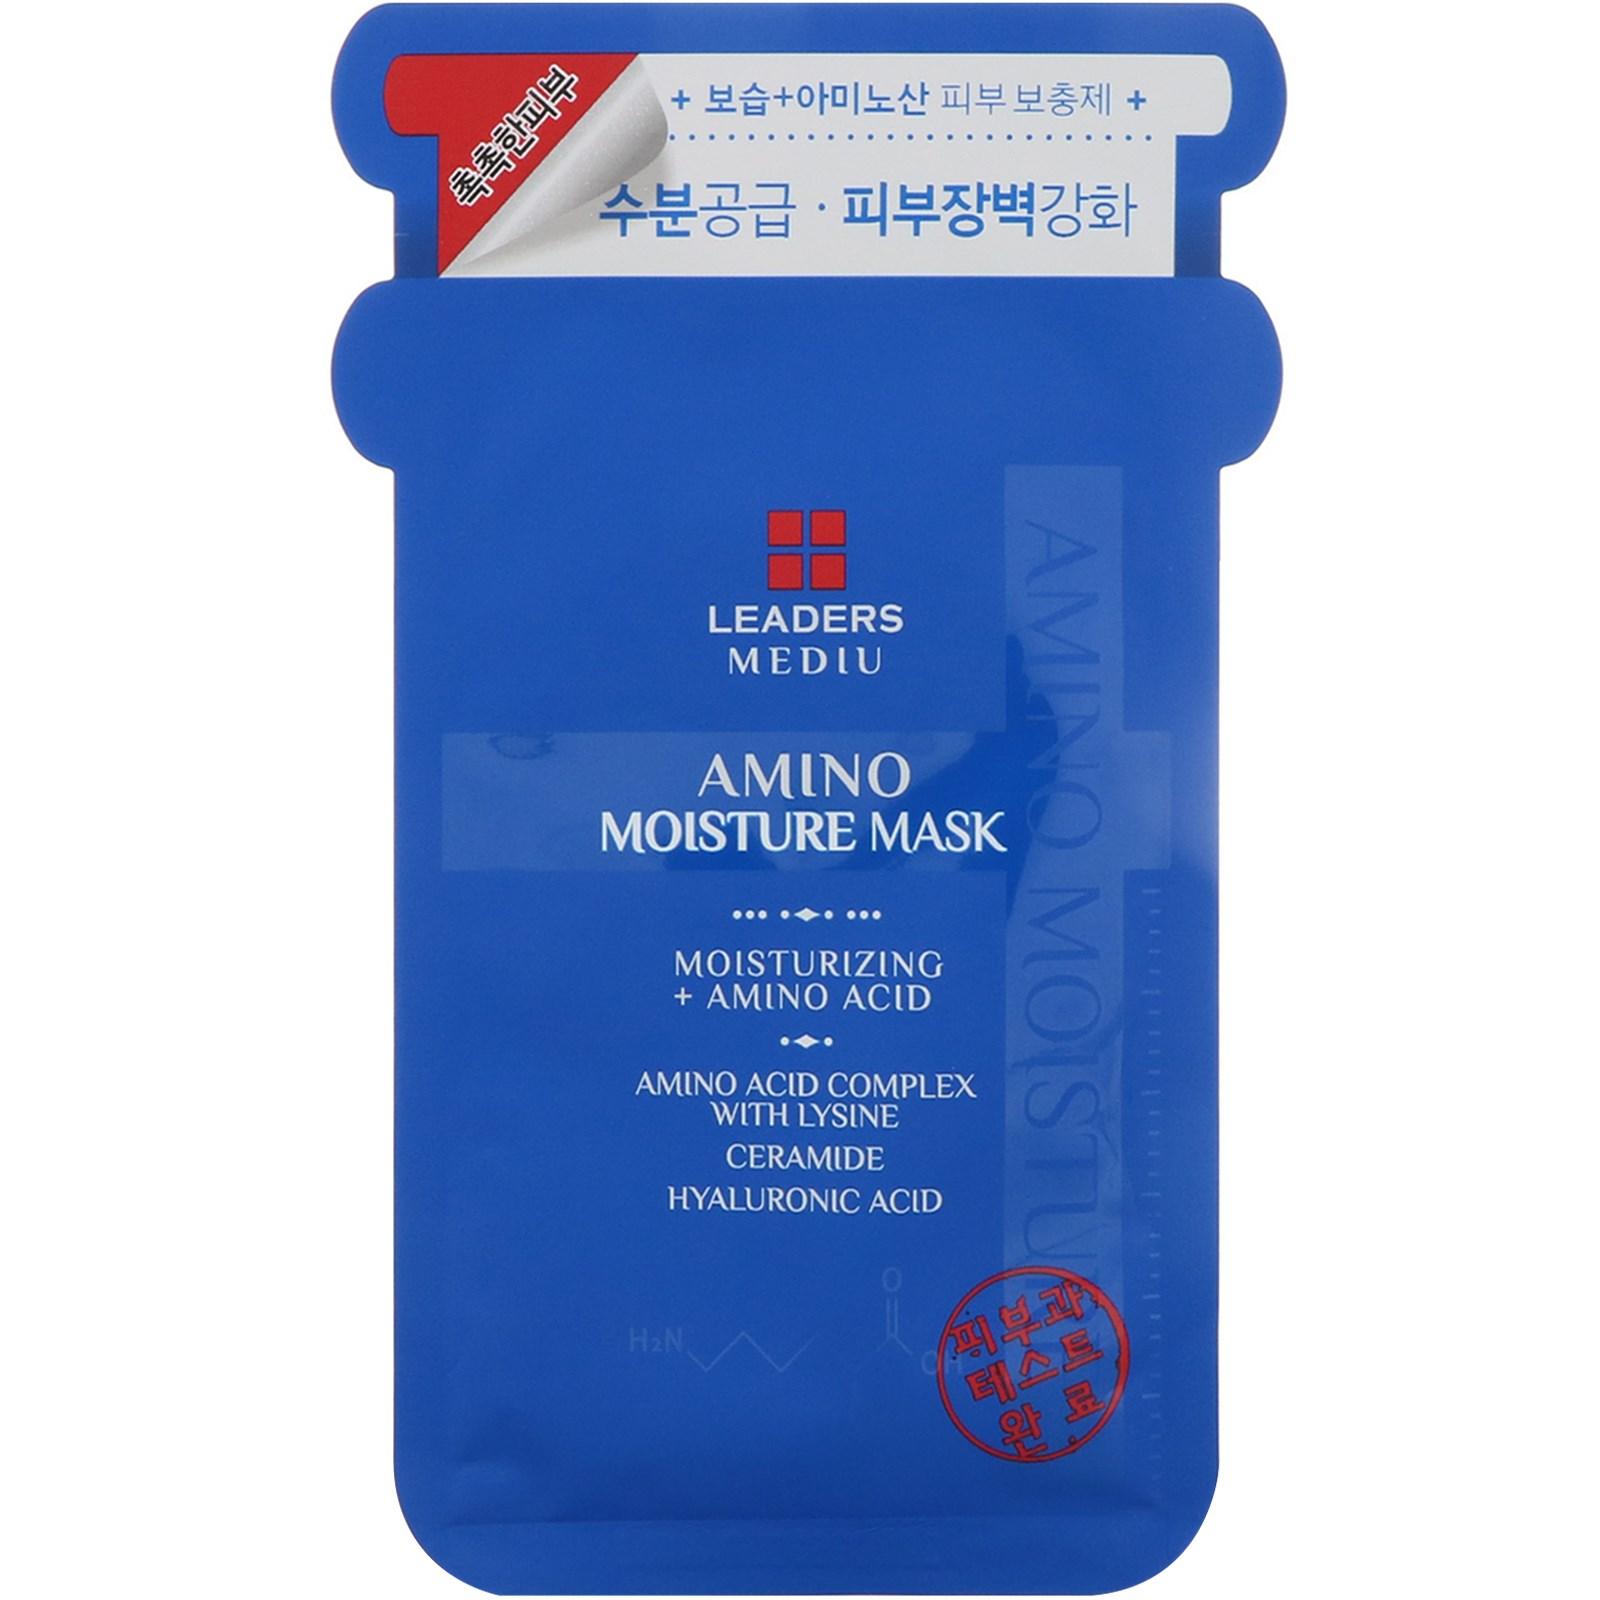 Leaders, Mediu, Amino Clearing Mask, 1 Mask, 25 ml(pack of 6) Fresh - Rice Dry Oil -100ml/3.3oz